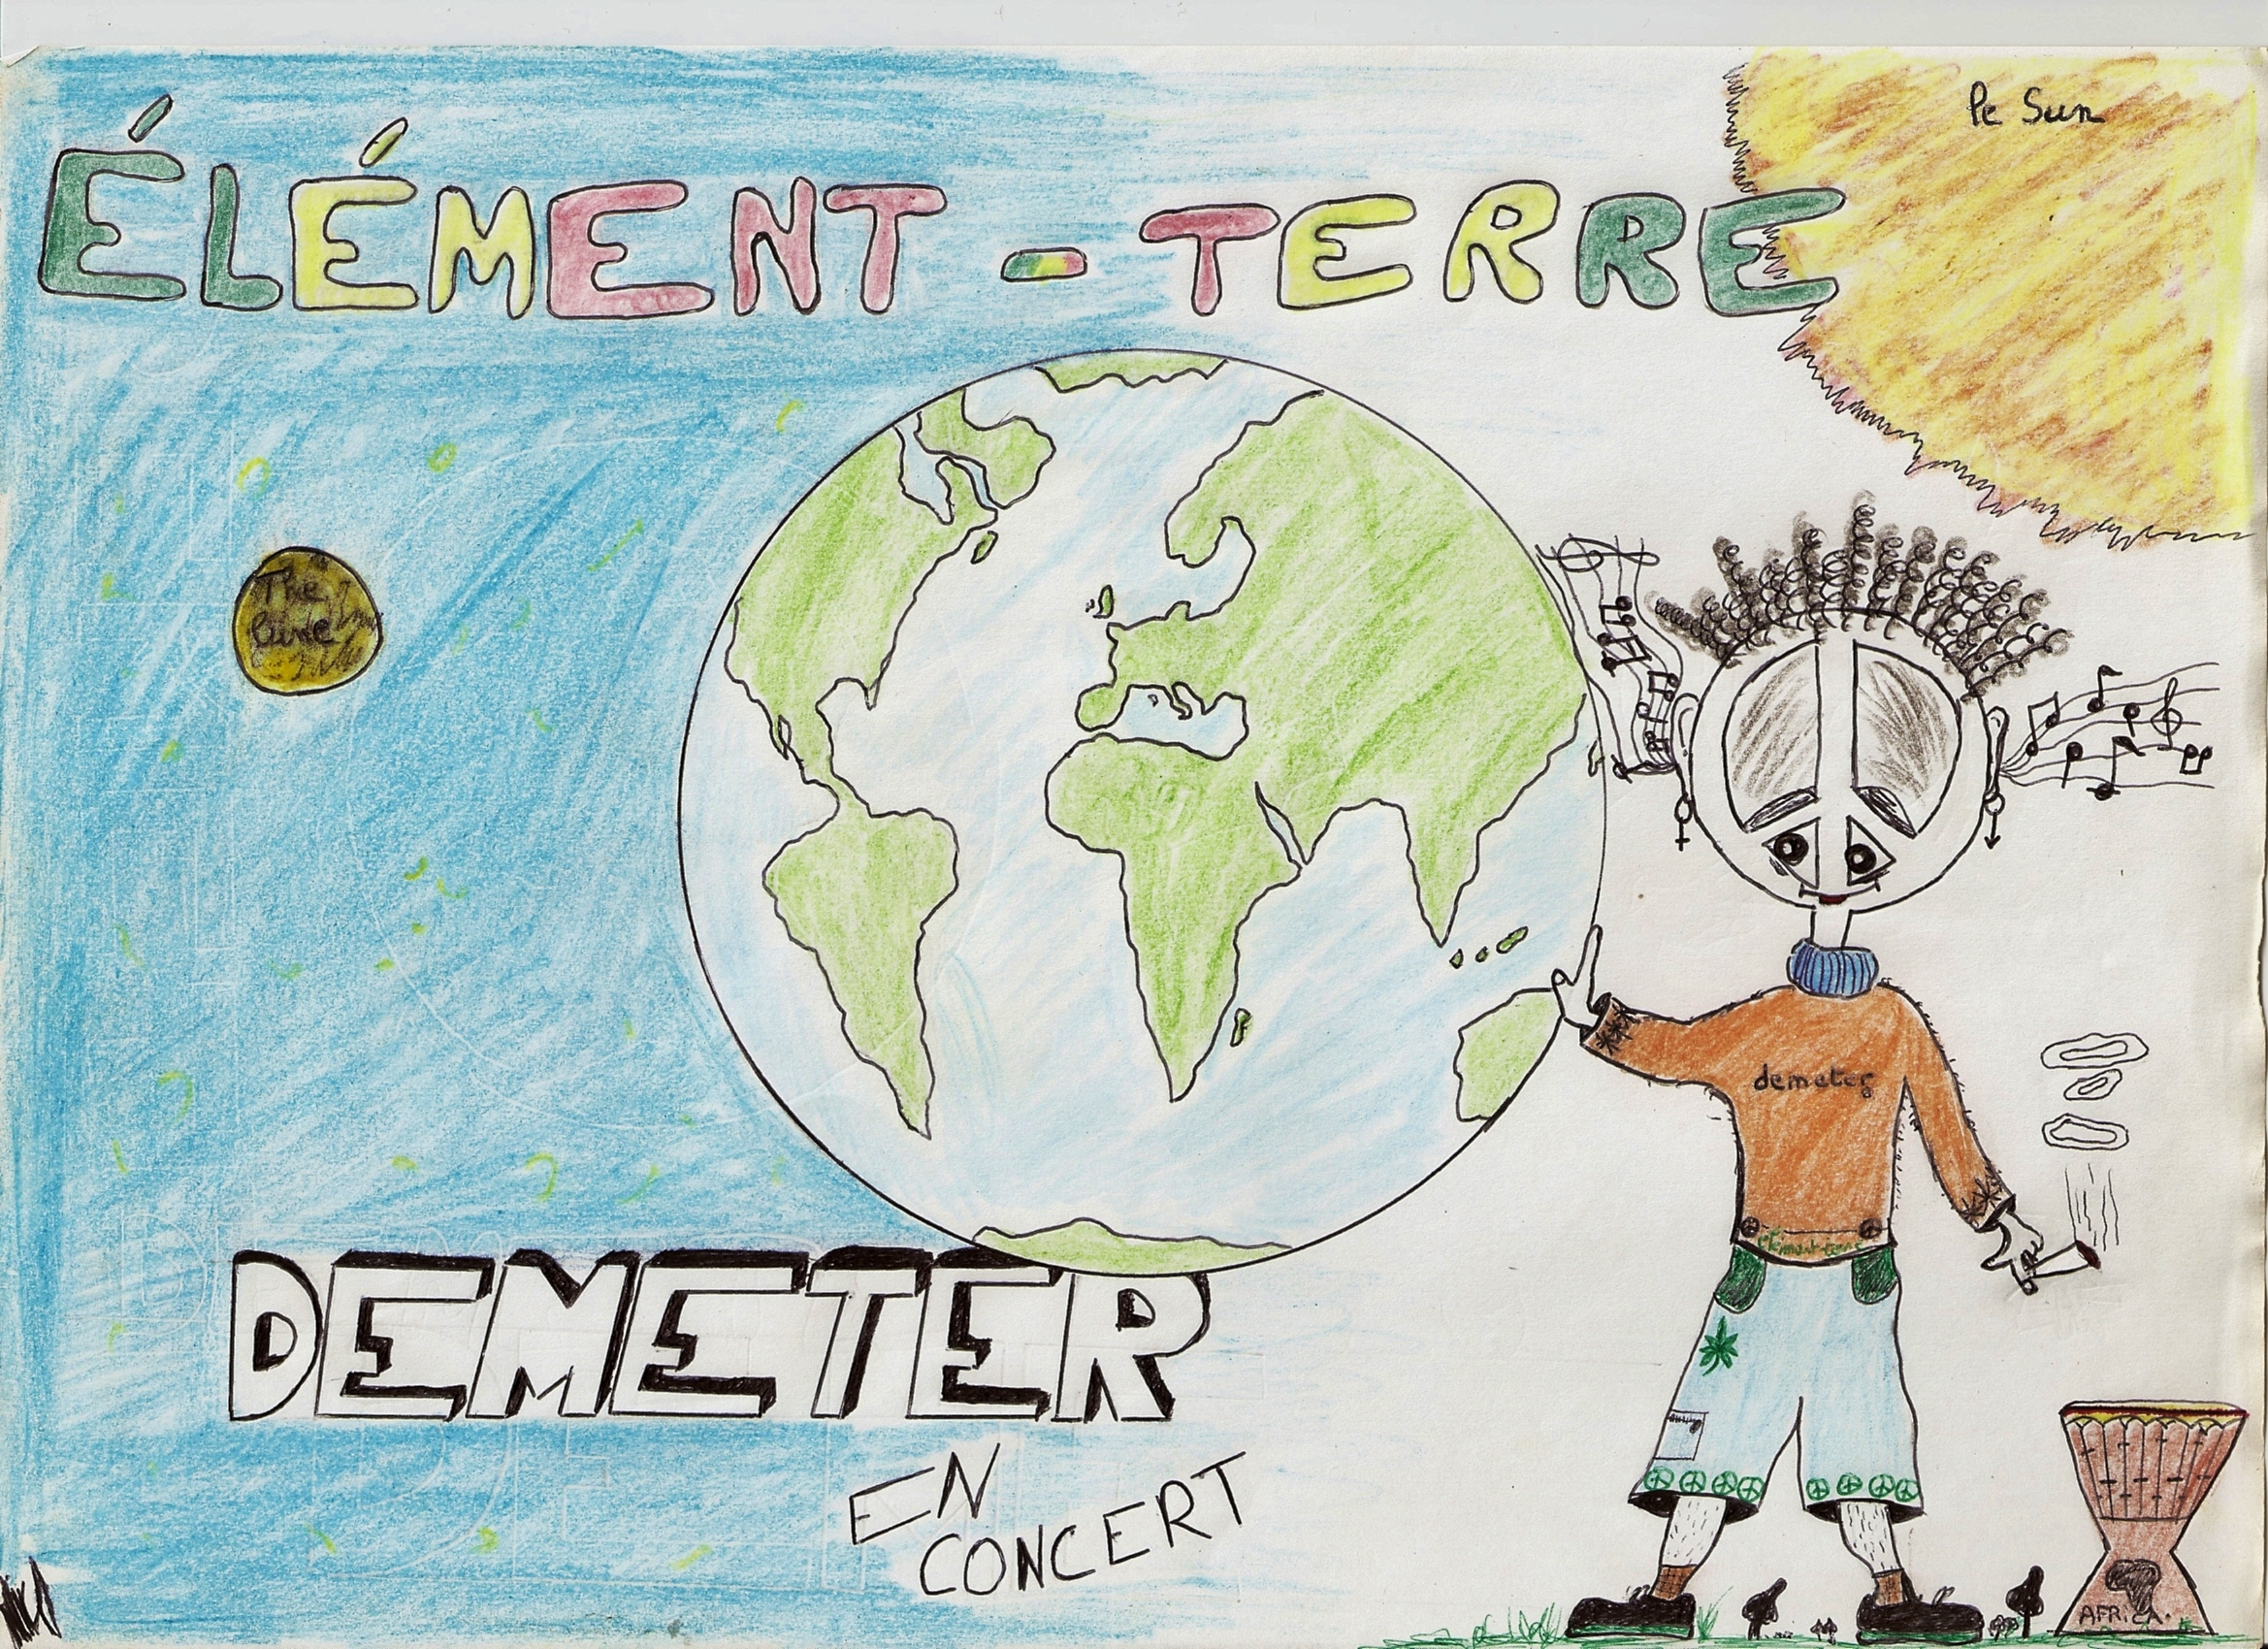 Demeter (141)